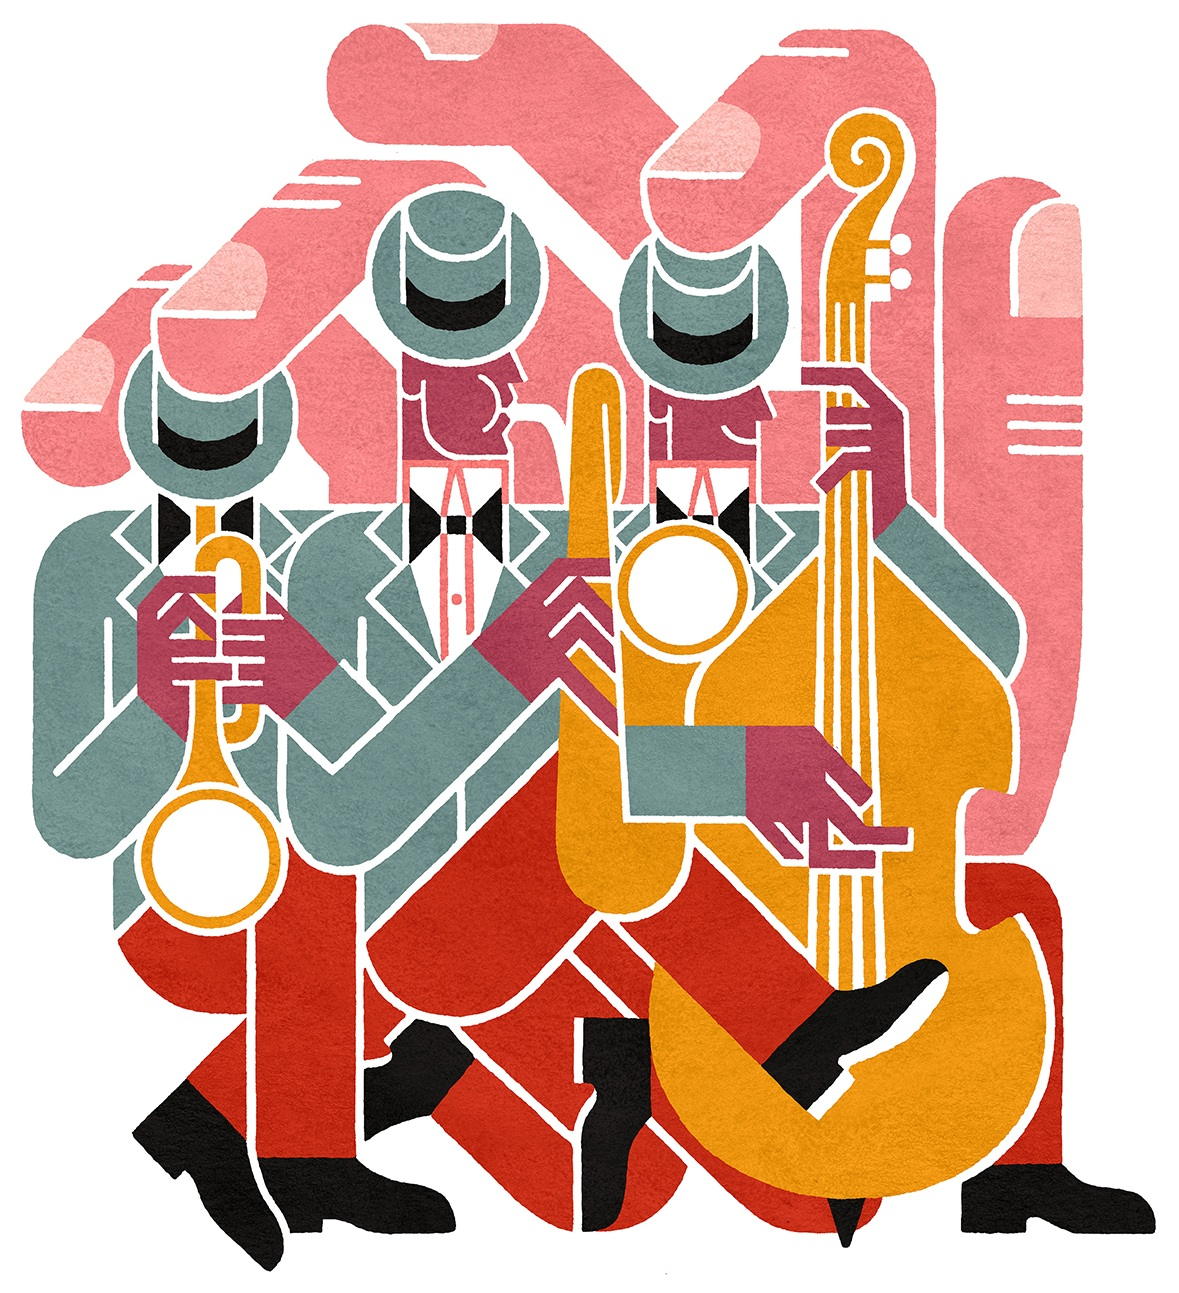 NJPC 2012 - ARTIST: Carlos ArrojoTITLE: Jazz Hand